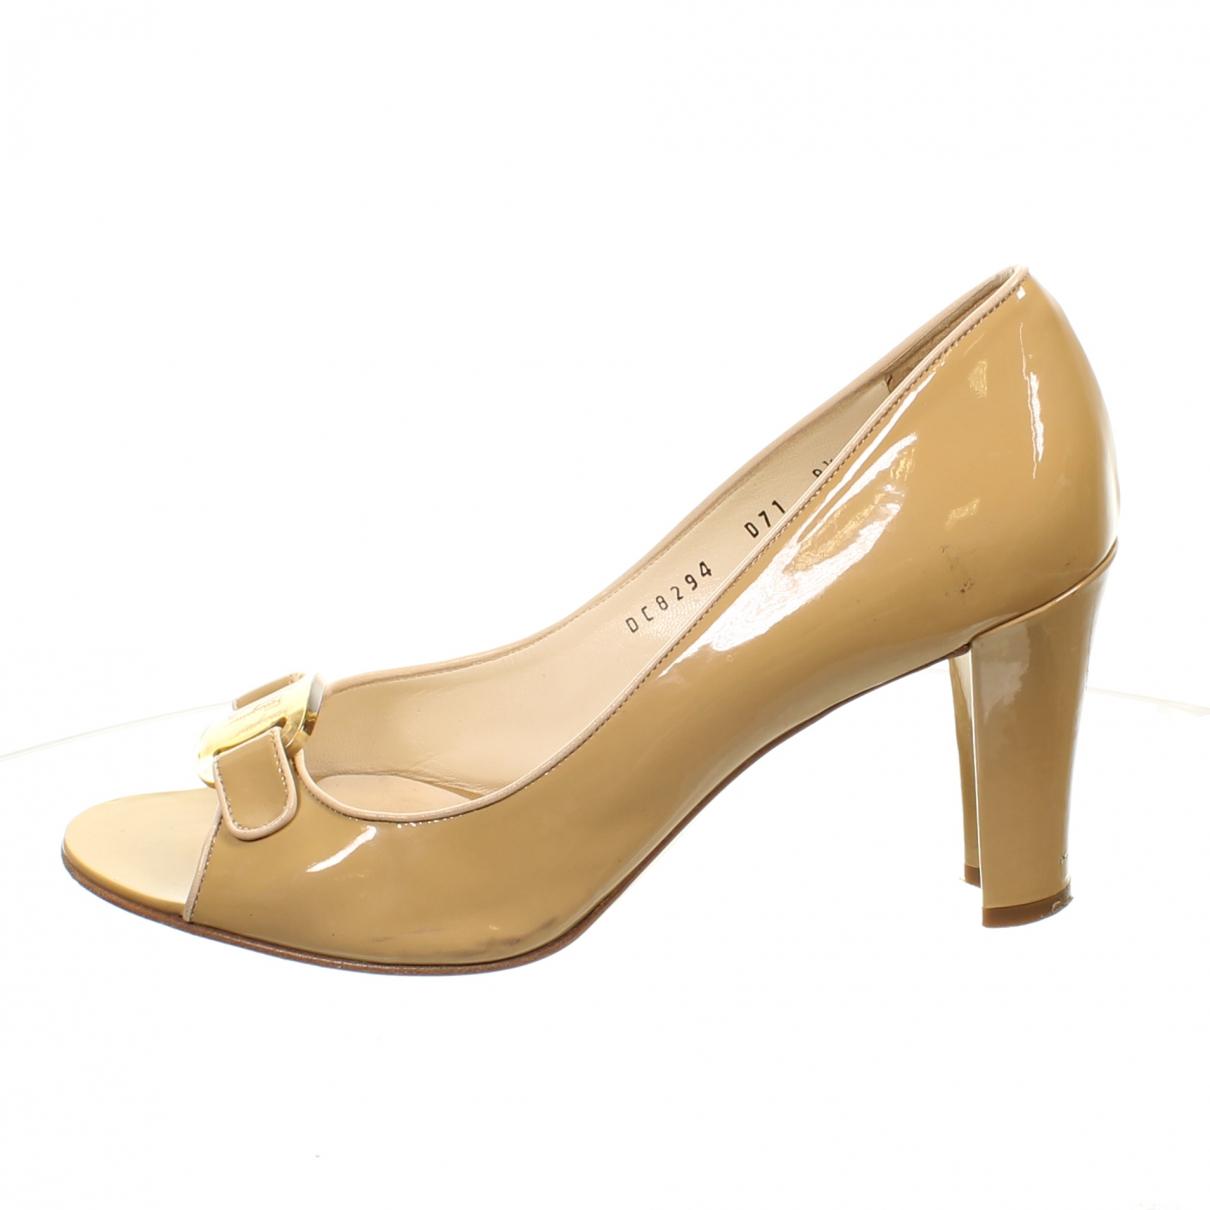 Salvatore Ferragamo \N Beige Patent leather Heels for Women 8.5 US